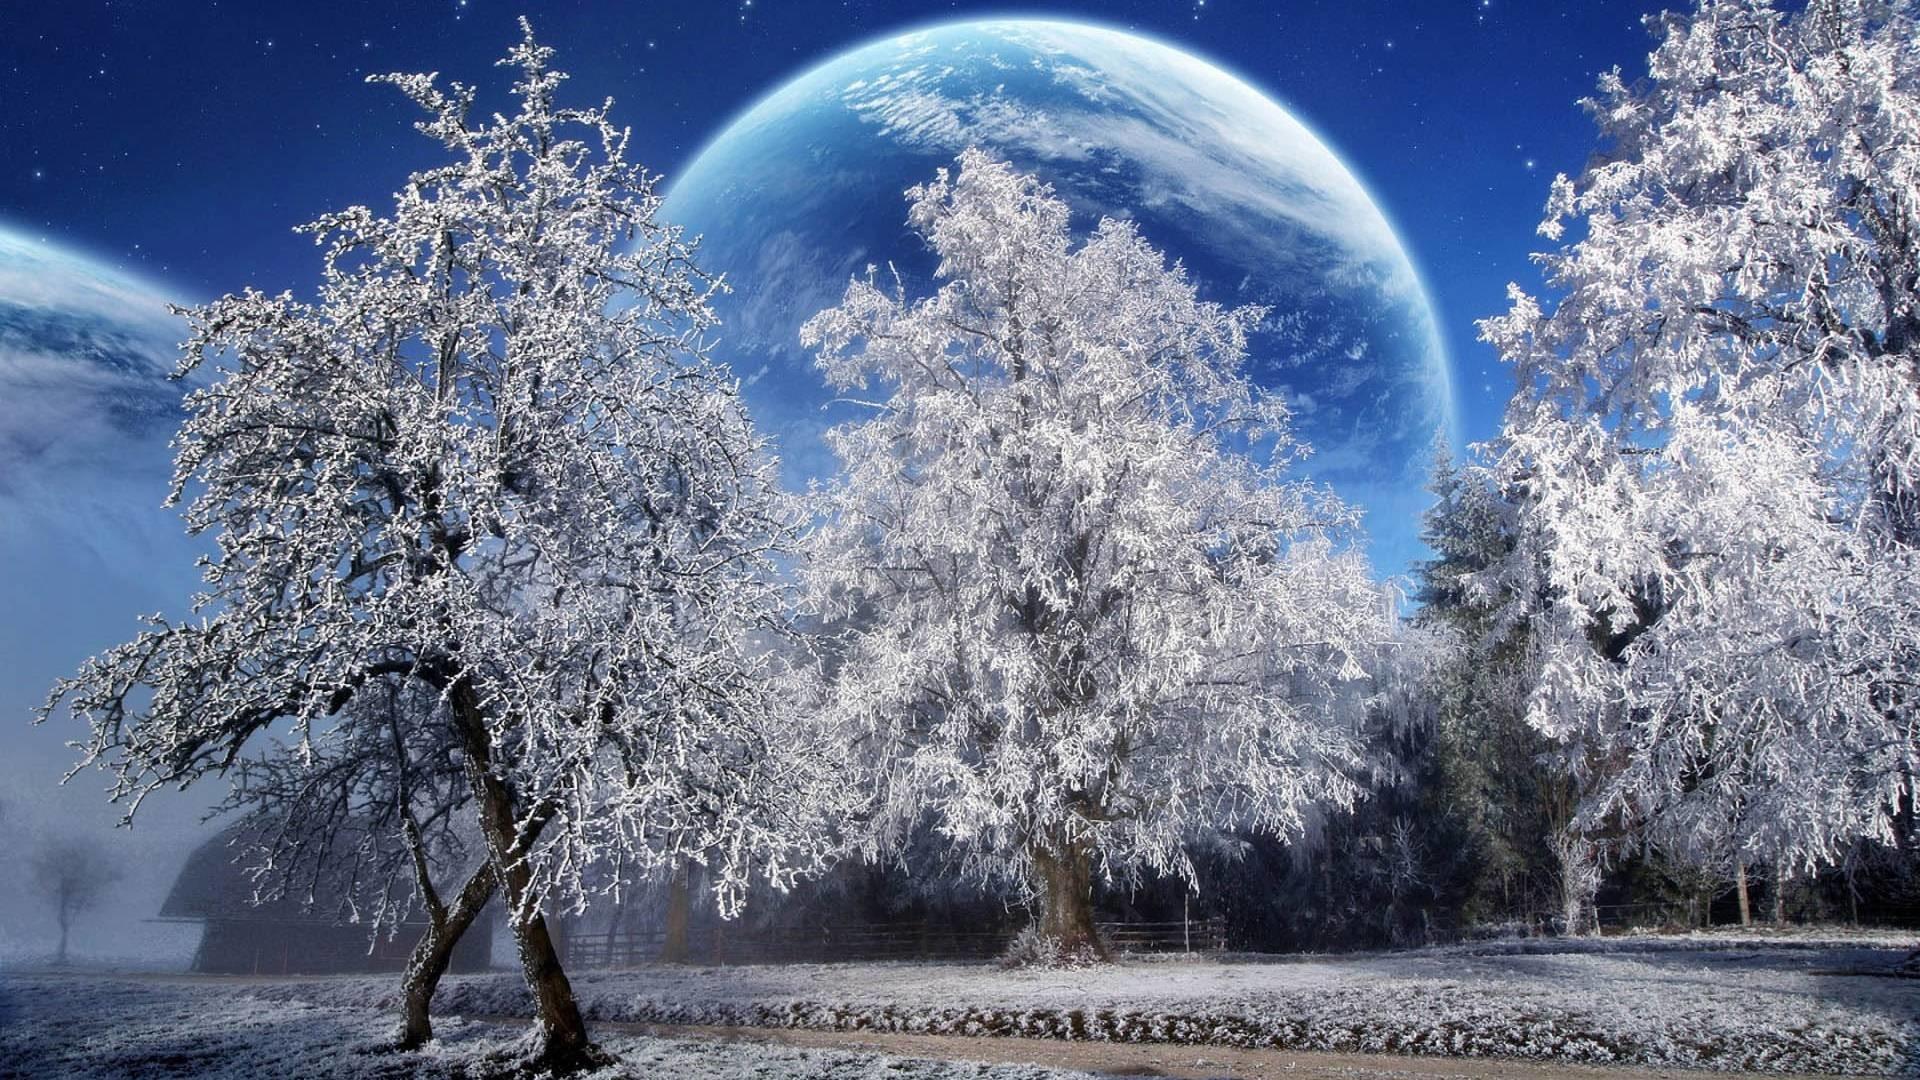 Wallpapers For > Beautiful Winter Wallpapers For Desktop